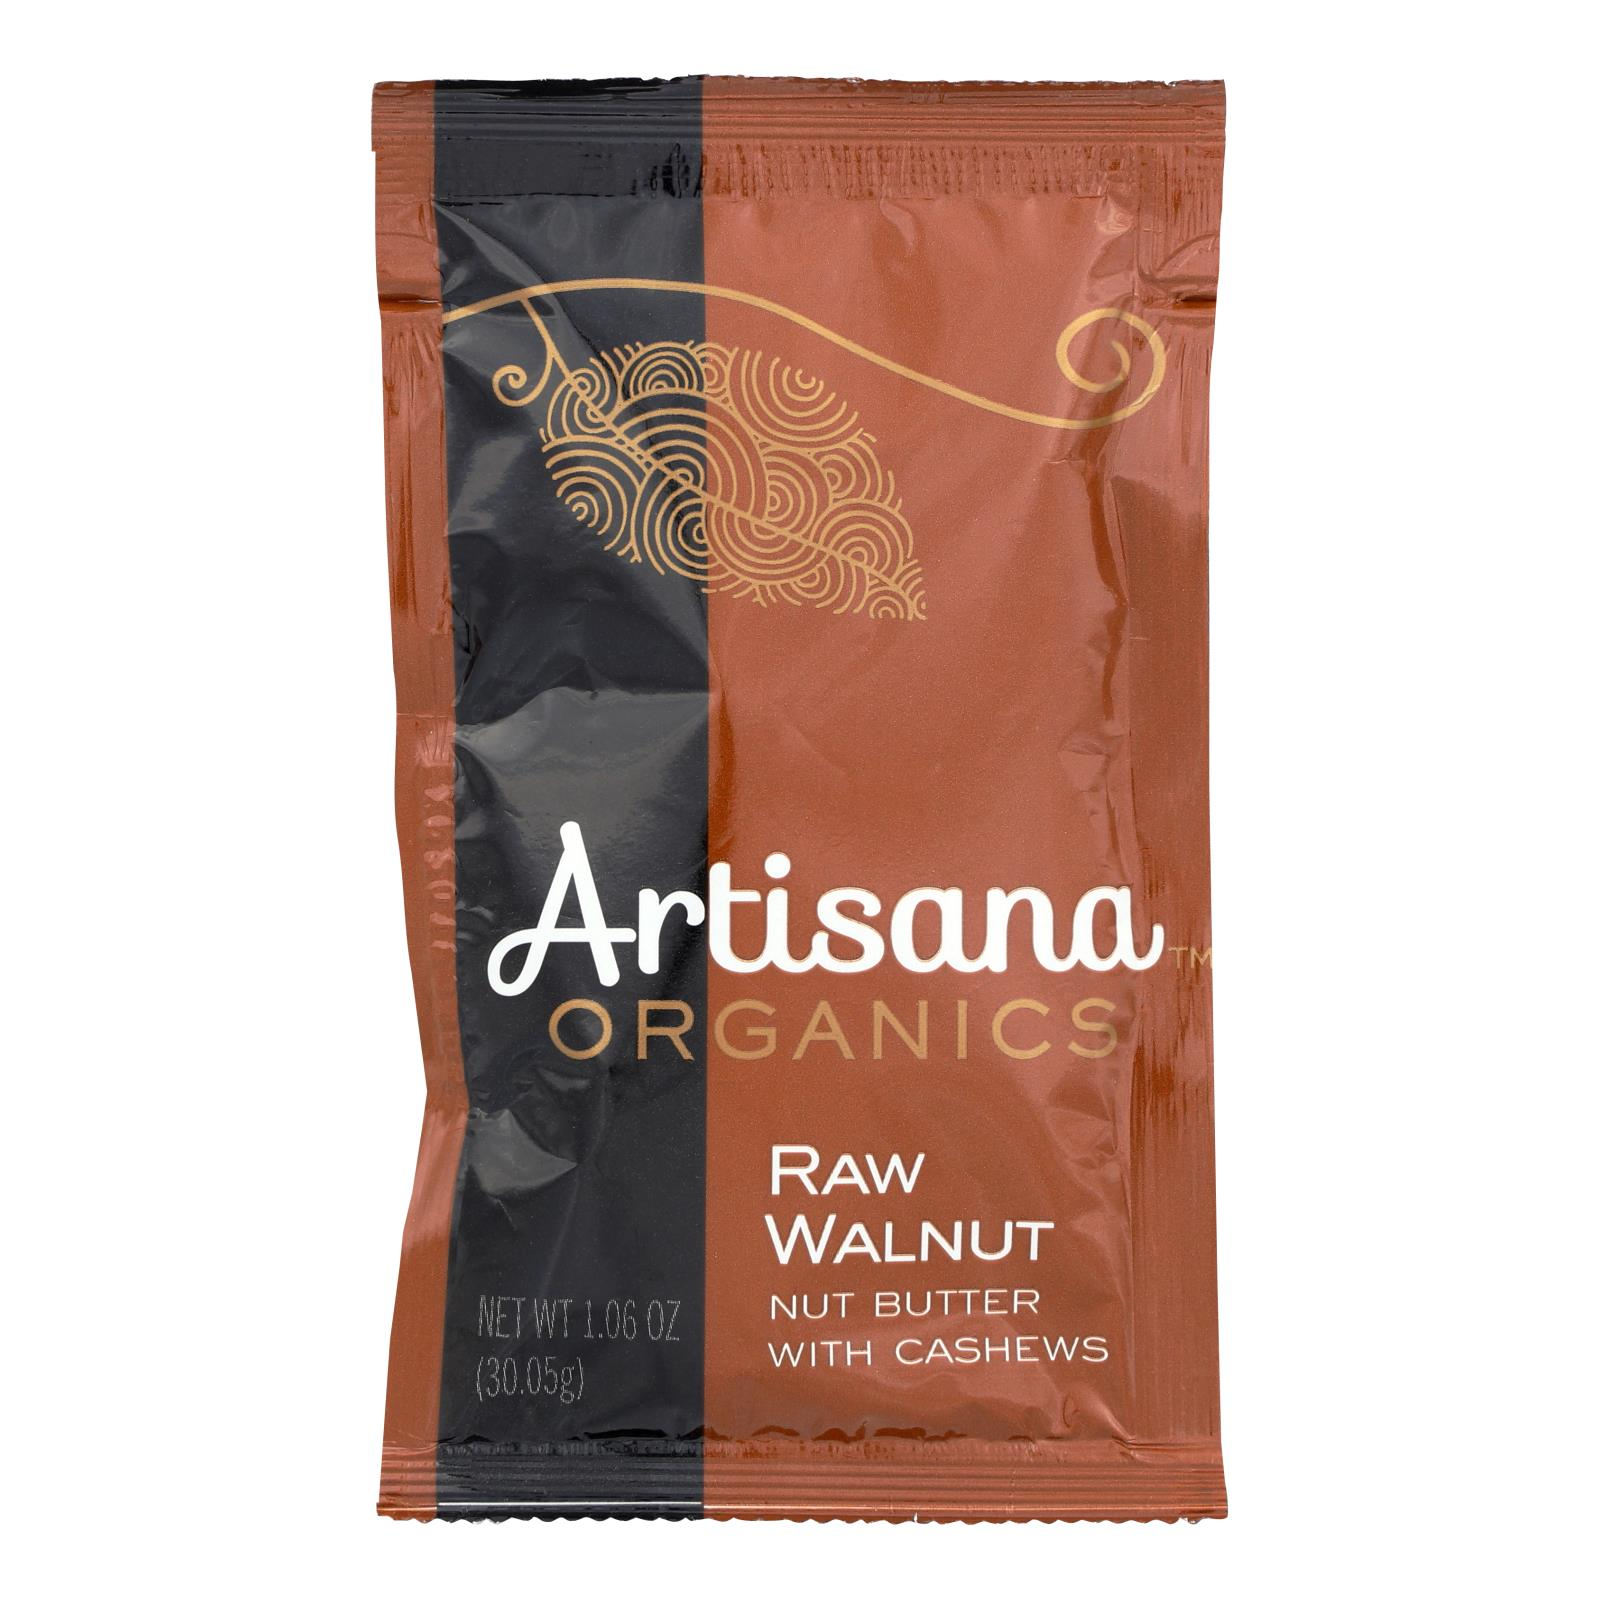 Artisana Organic Raw Walnut Butter - Squeeze Packs - 1.06 oz - Case of 10